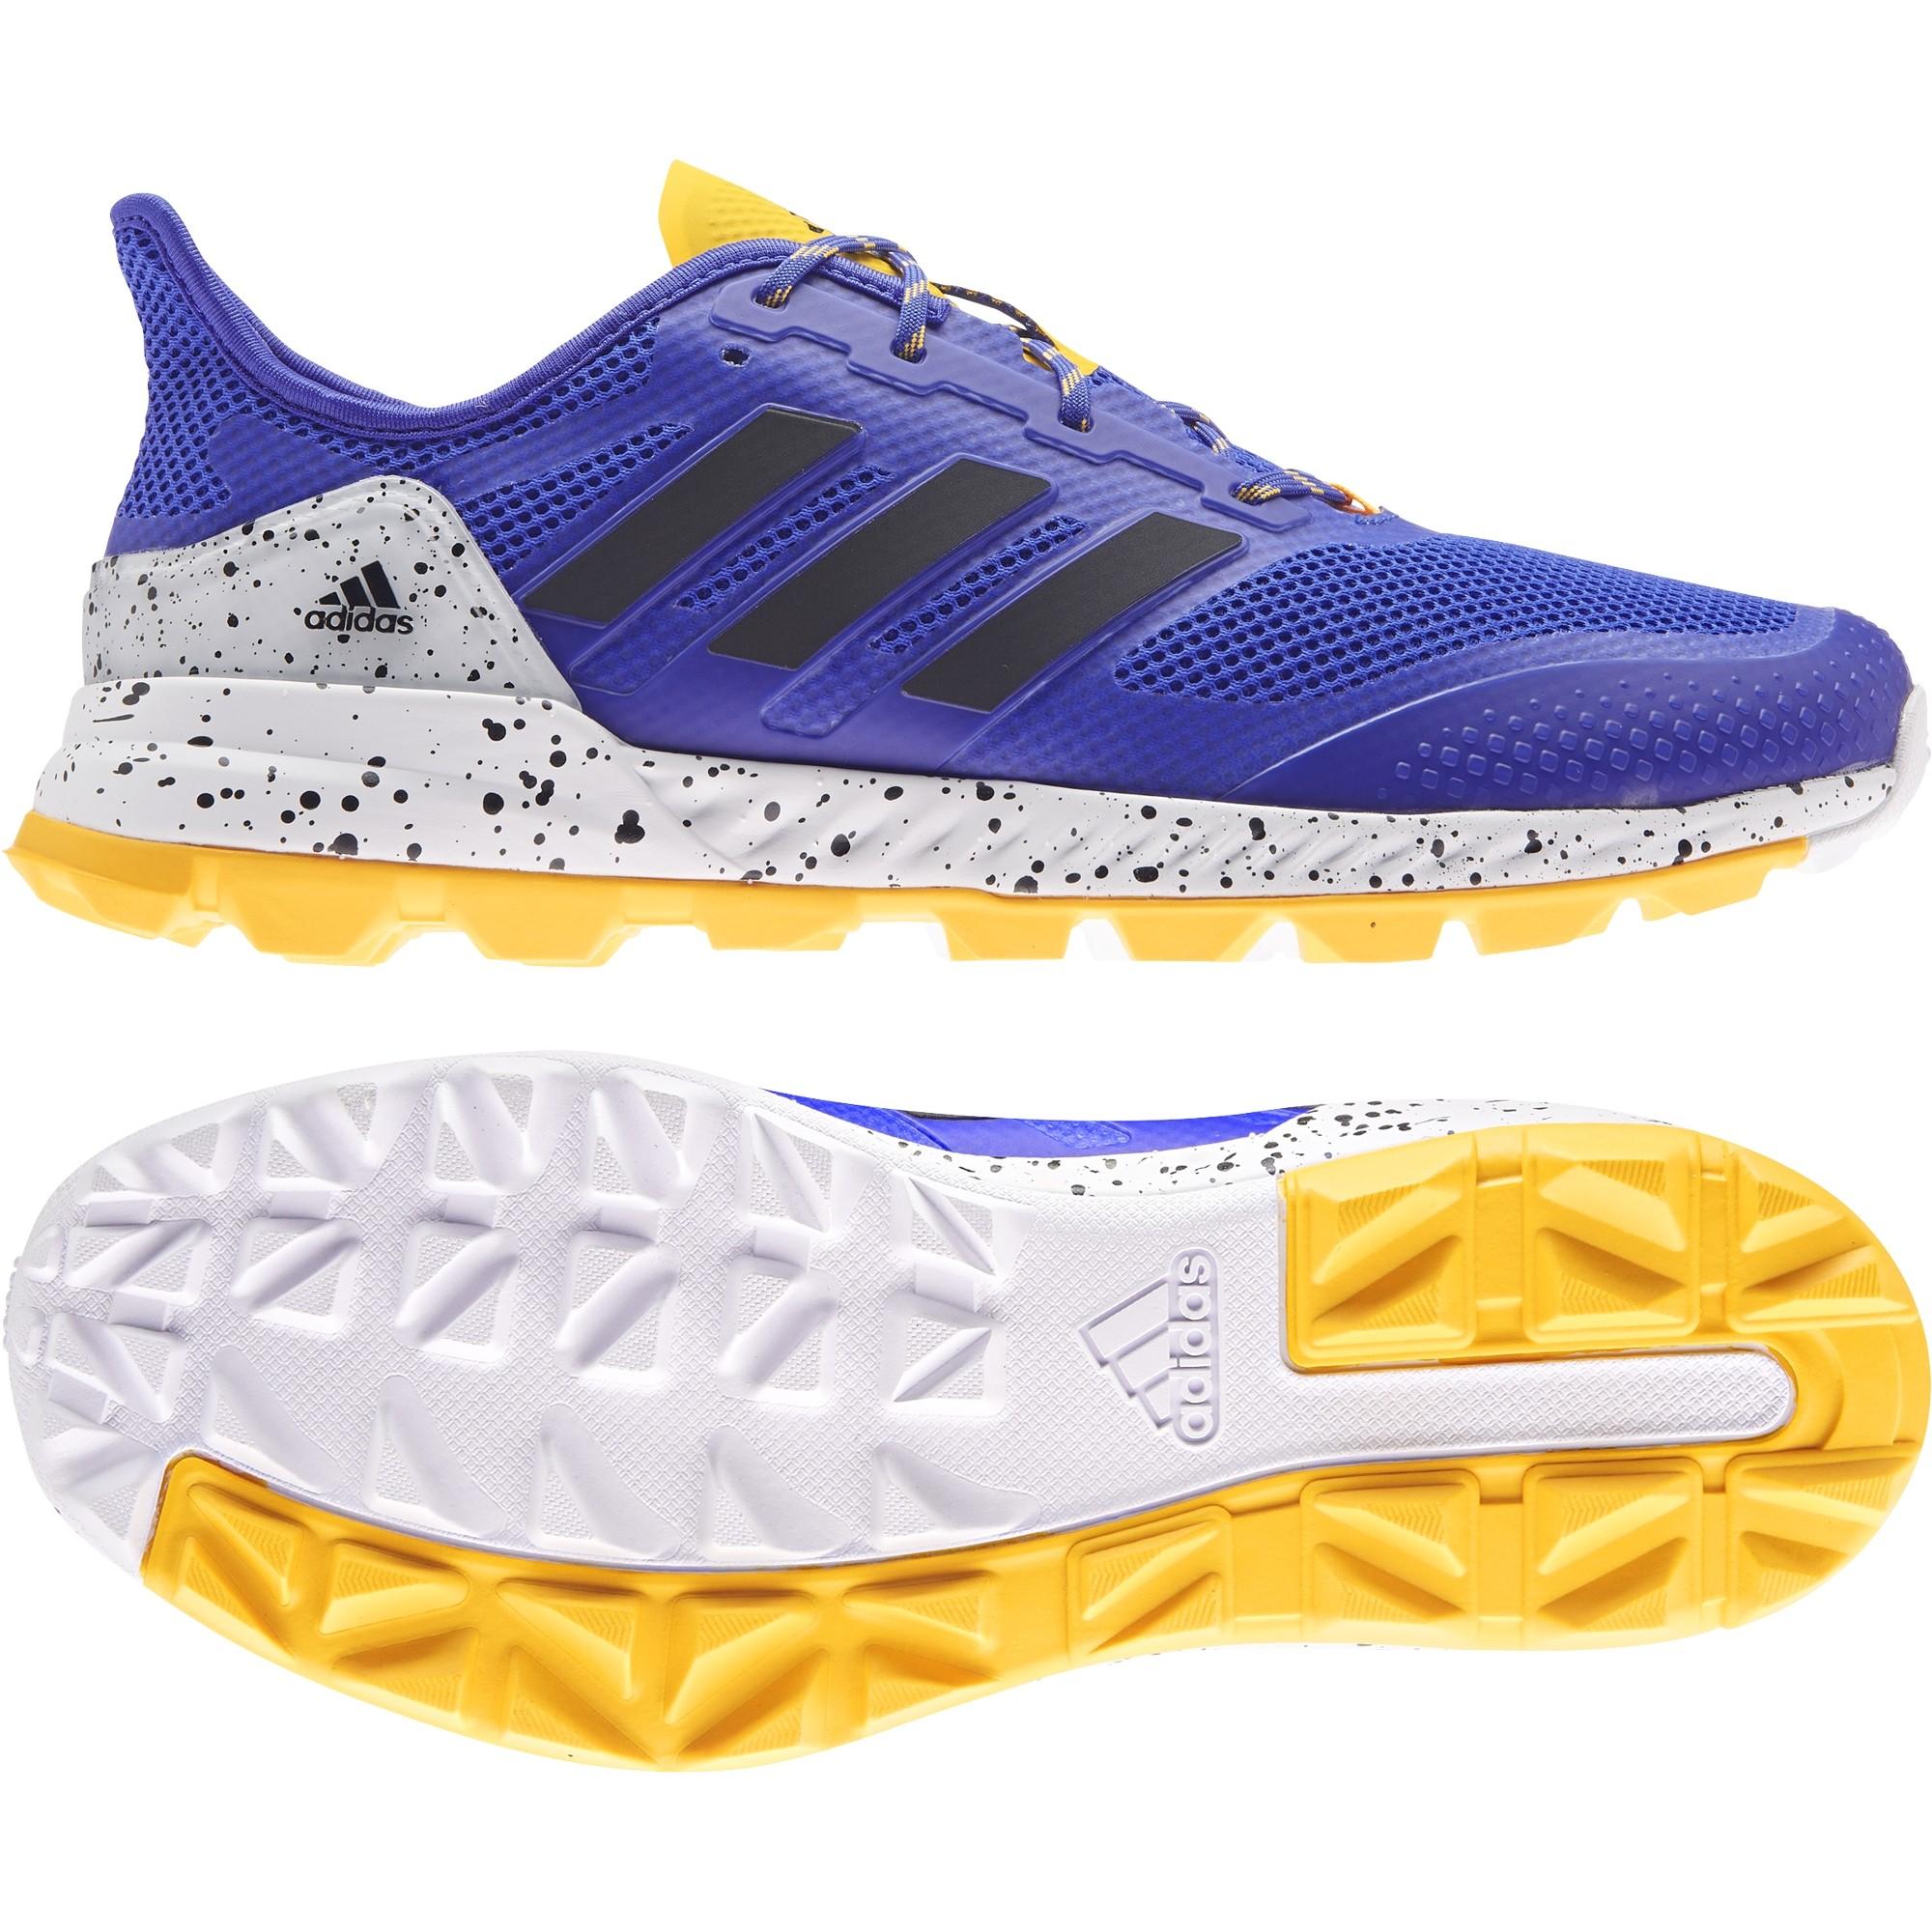 2021/22 Adidas Adipower 2.1 Hockey Shoes - Blue/White/Yellow